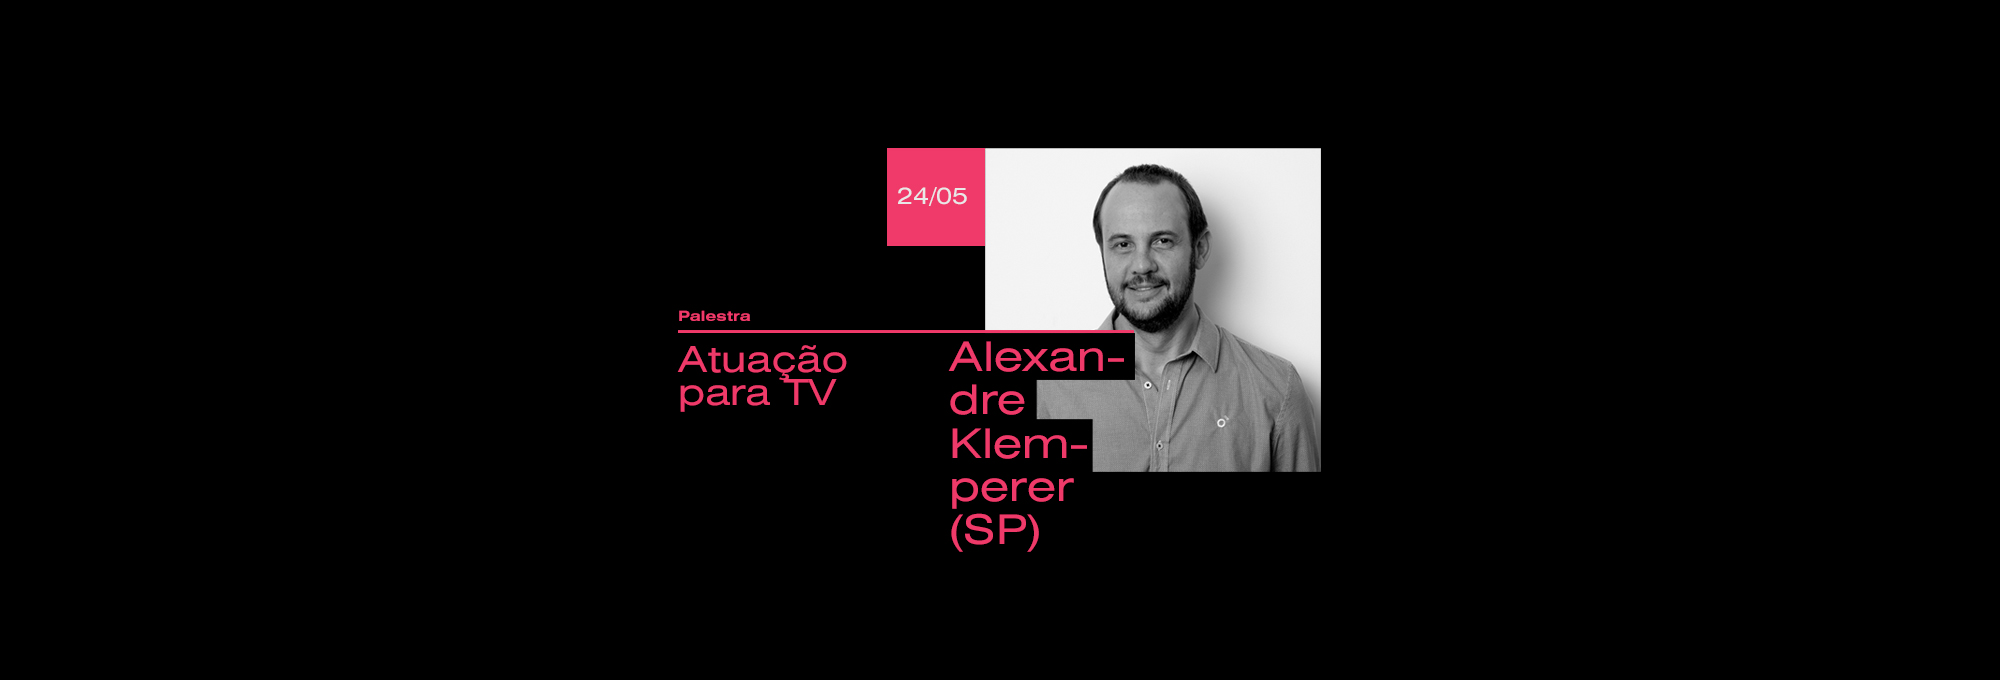 Palestra do Diretor Alexandre Klempere na AIC São Paulo